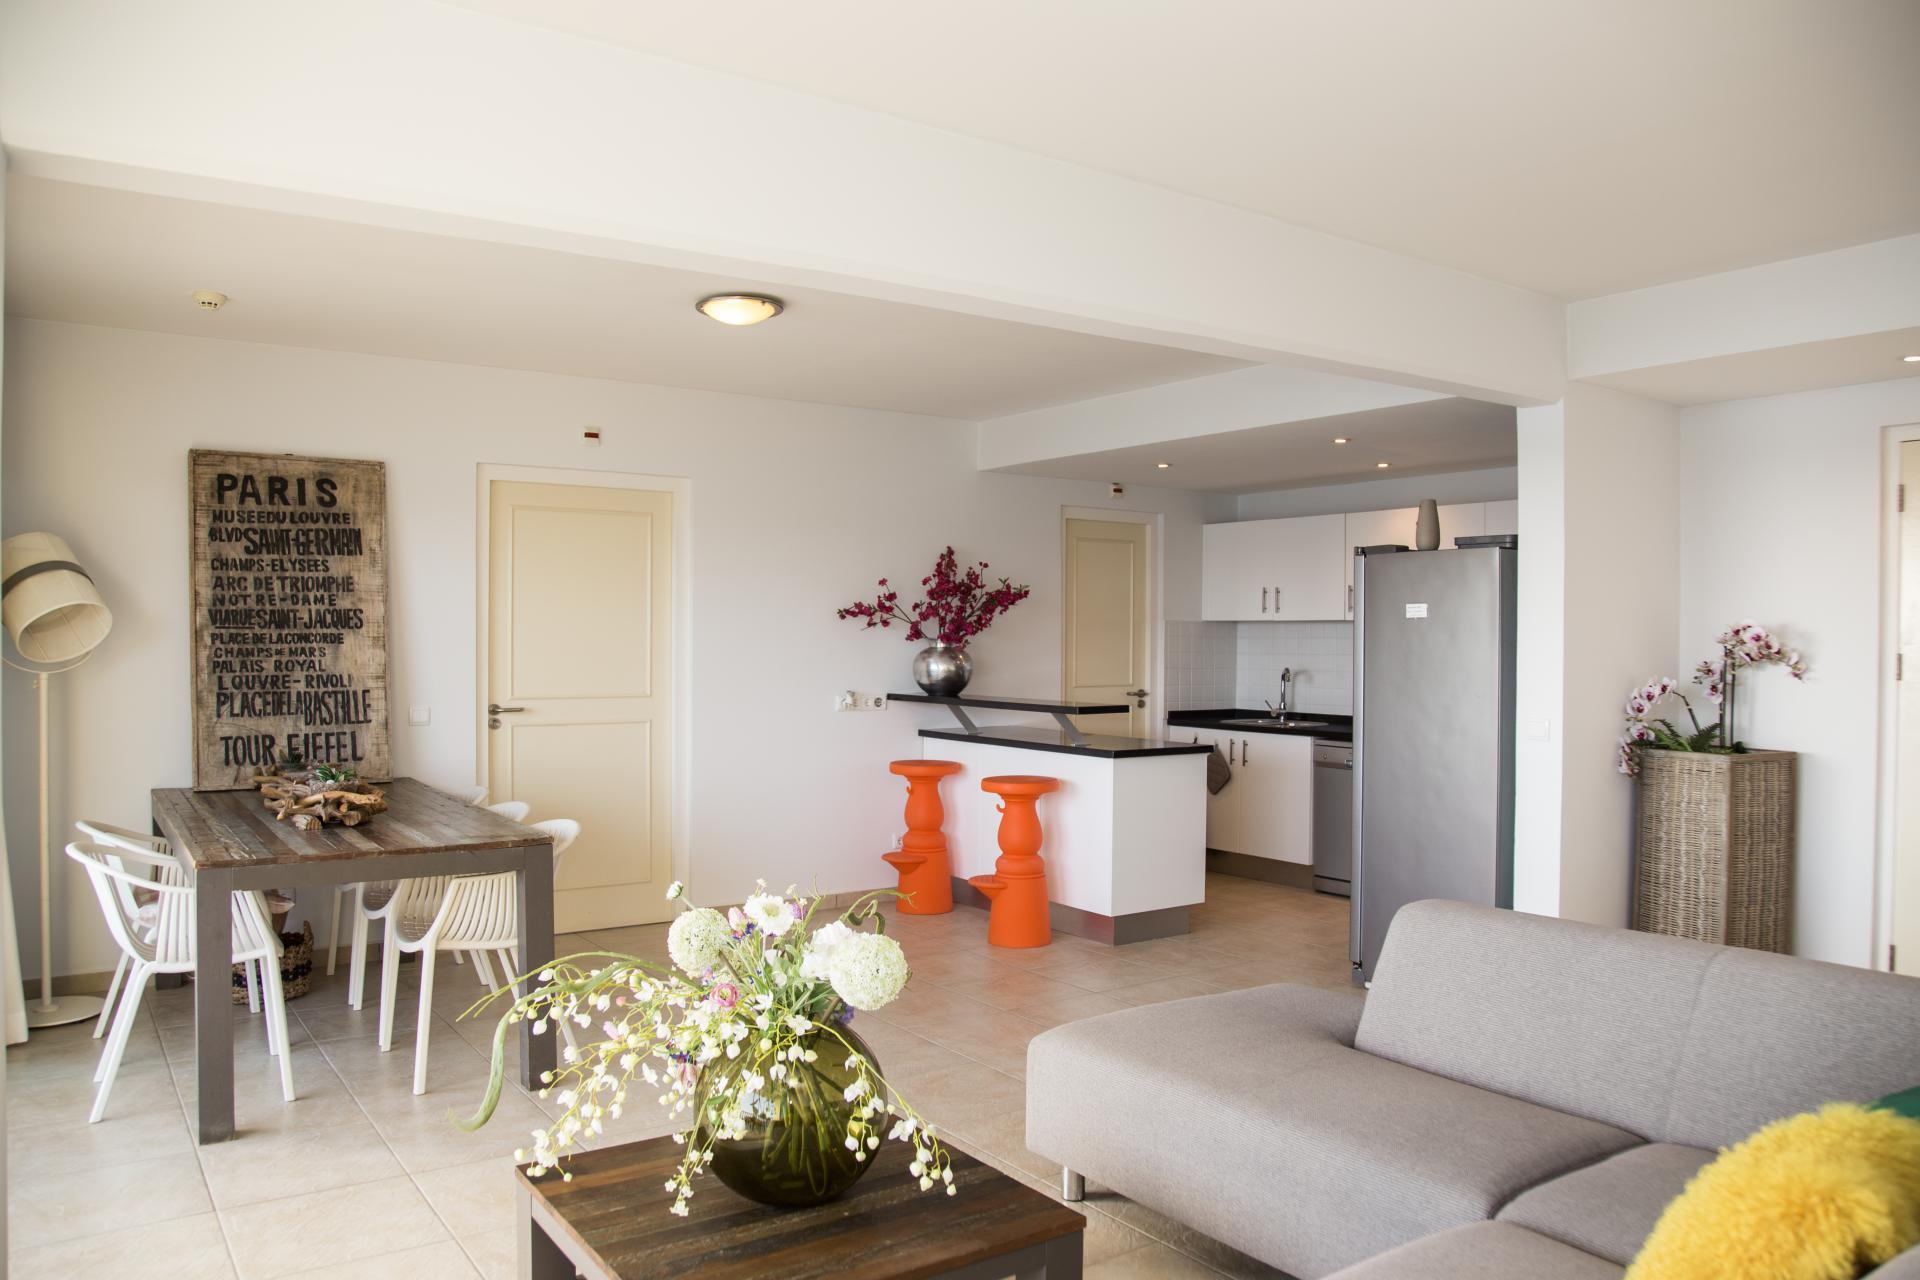 Grote woonkamer met open keuken